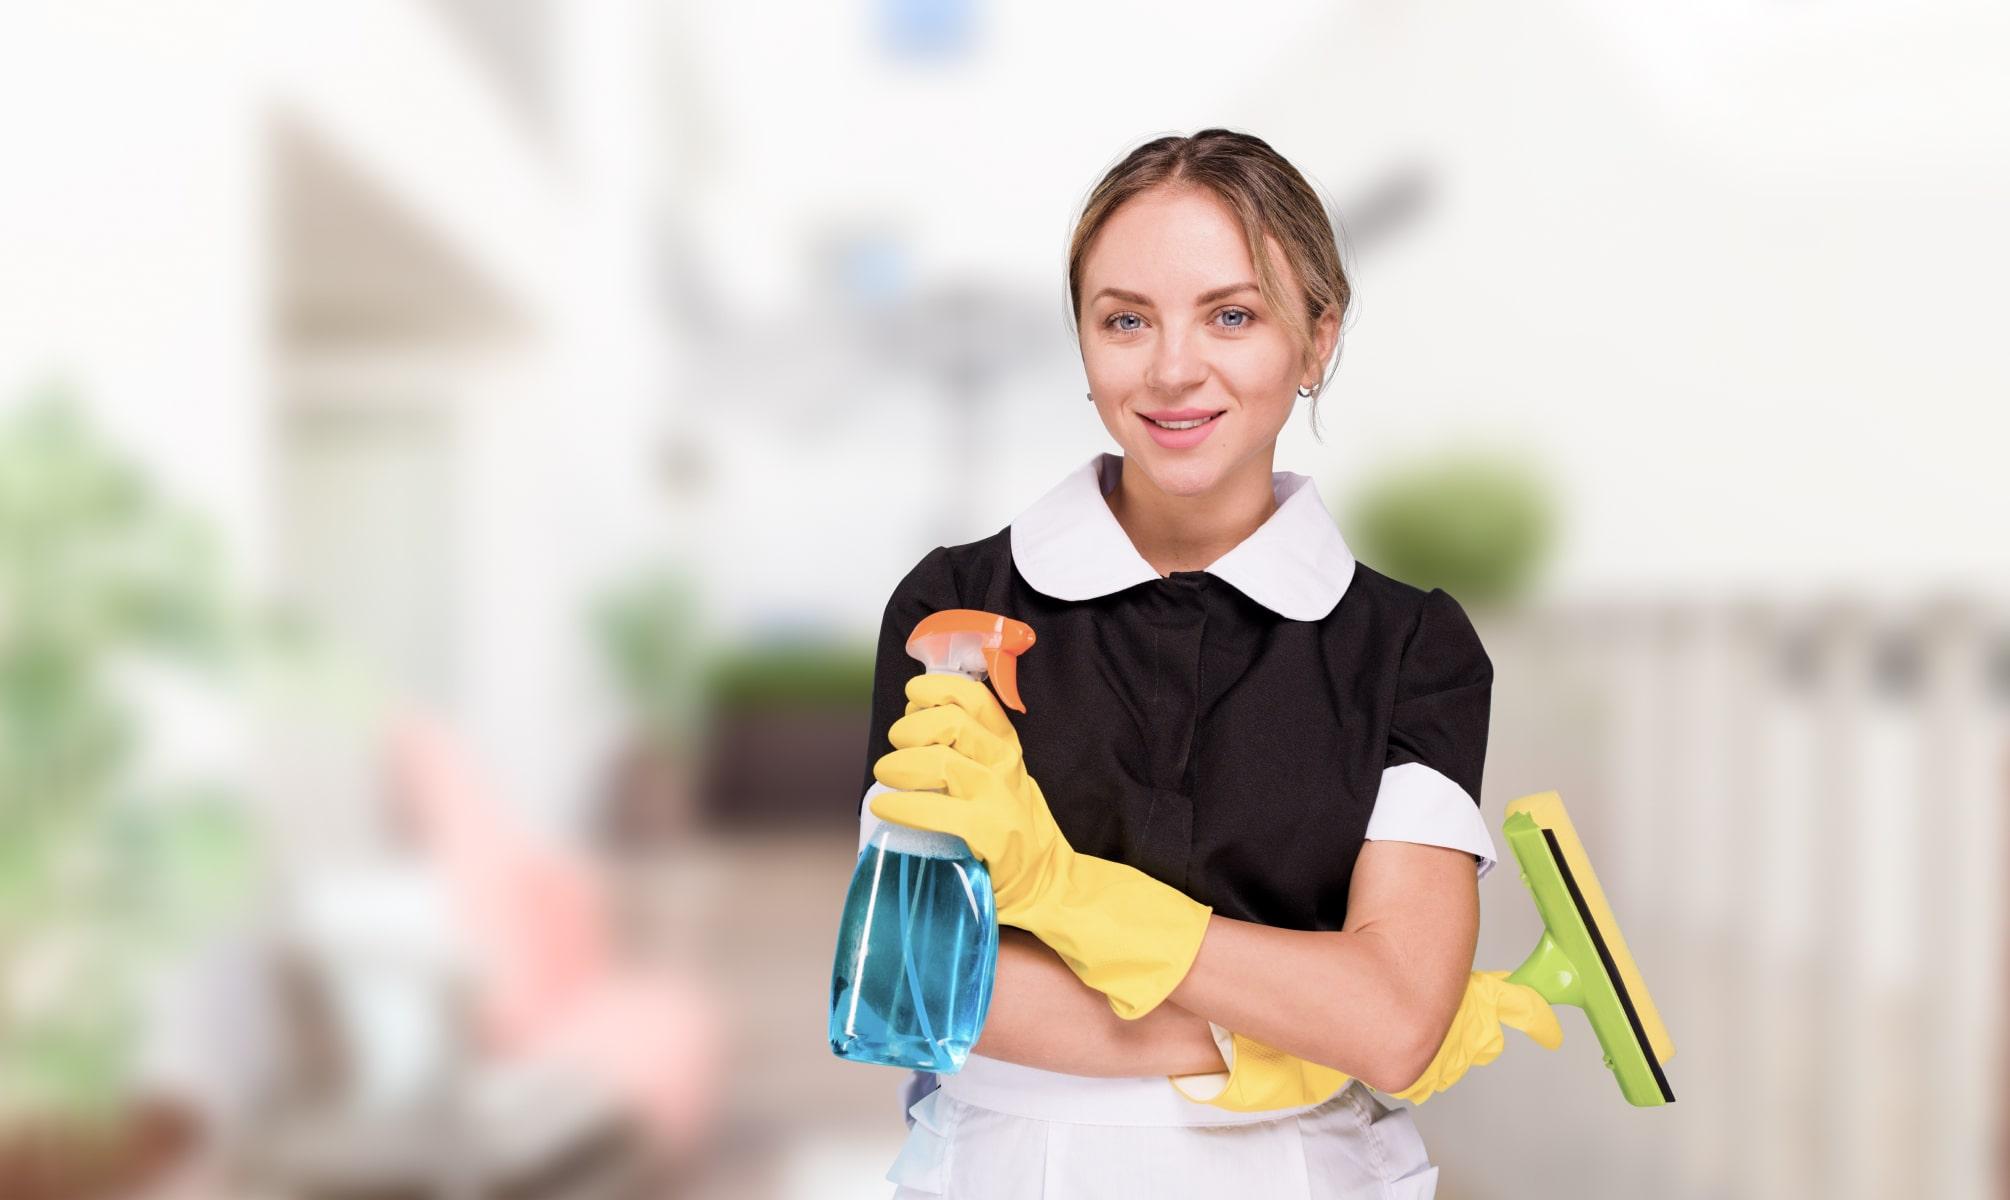 нарушил домашний персонал домработница фото работа ру новшество